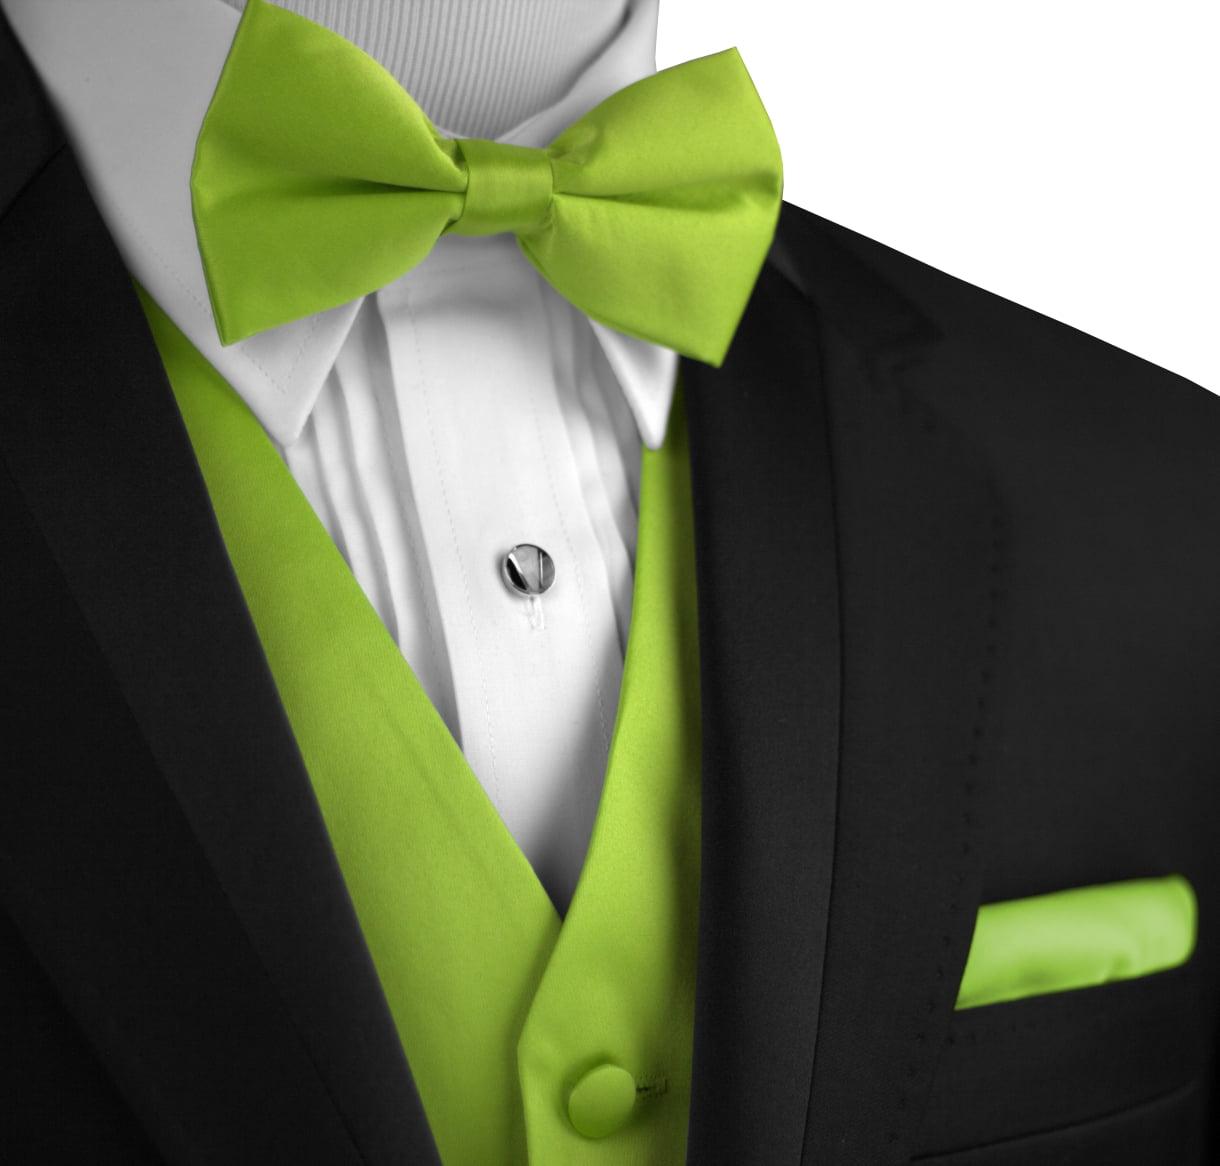 Italian Design, Men's Tuxedo Vest, Bow-Tie & Hankie Set in Lime